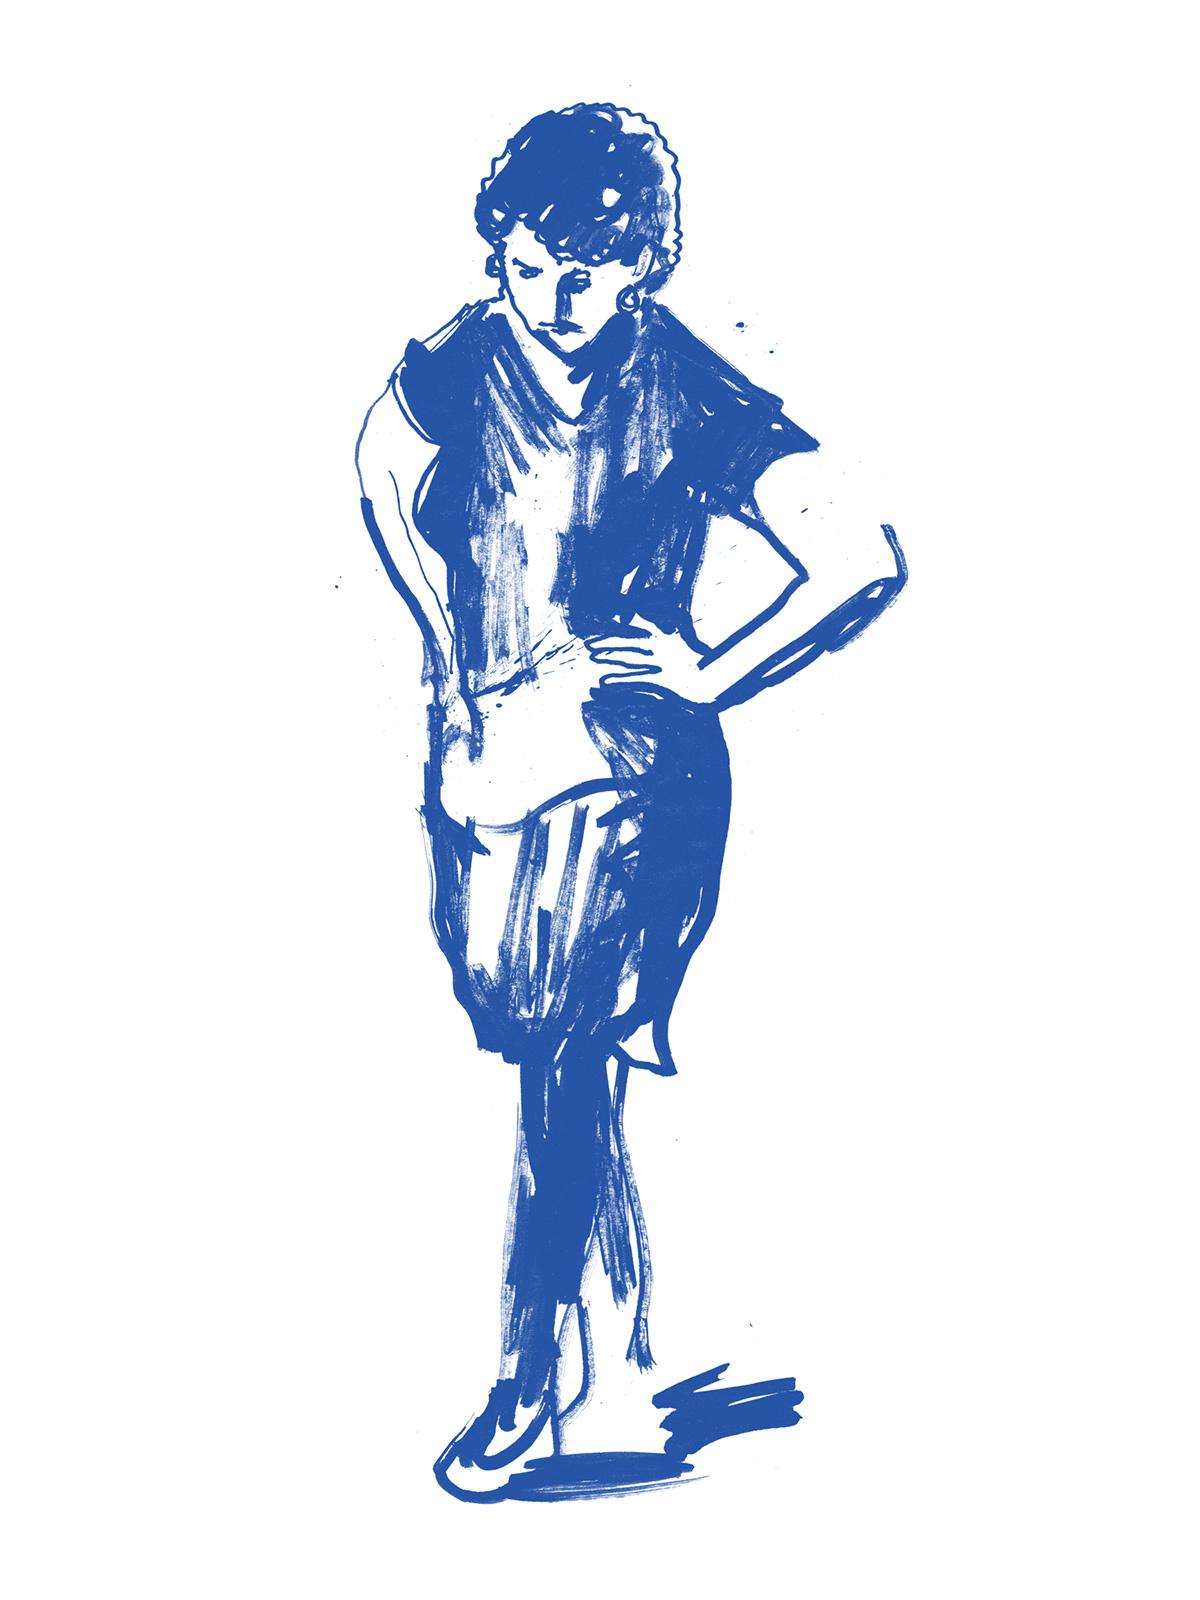 Ben Tallon magazine cover, hand drawn editorial, magazine, zine illustration by Ben Tallon illustrator